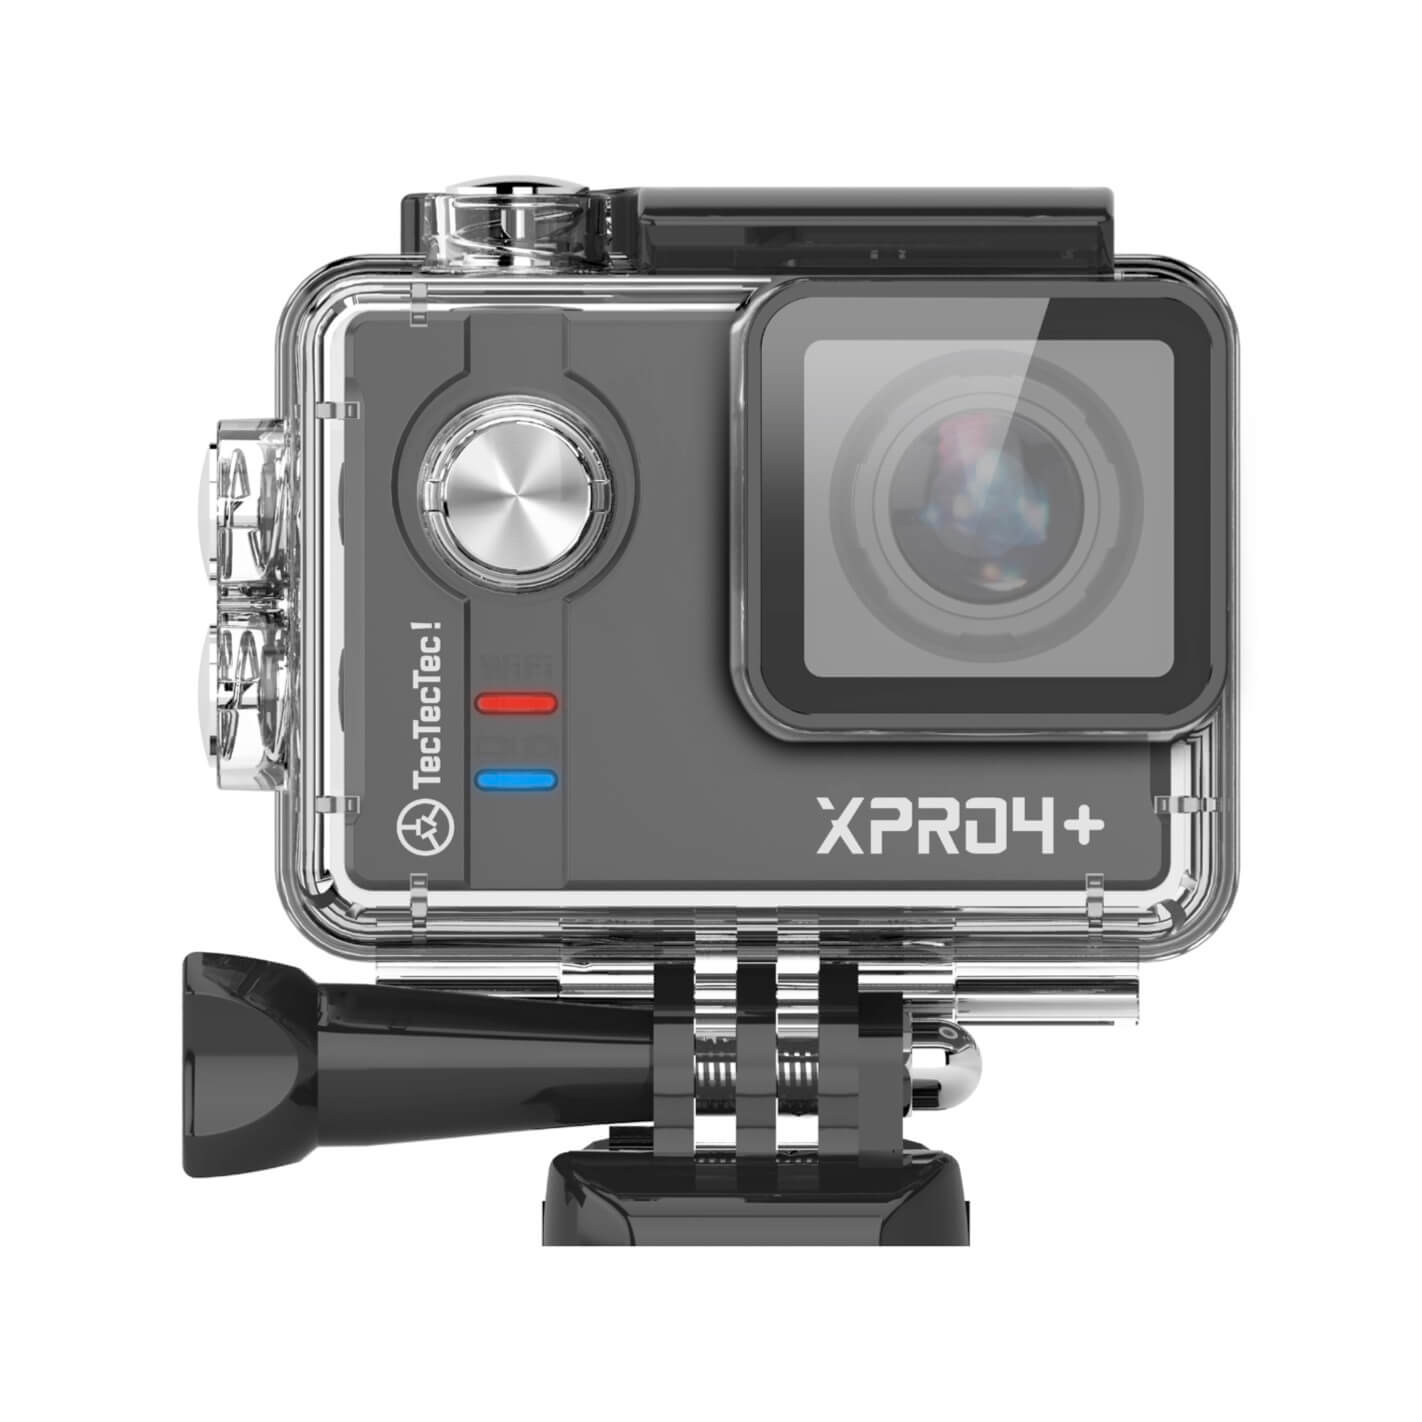 Meilleure Caméra d'action TecTecTec Ultra HD XPRO4+_ Noir